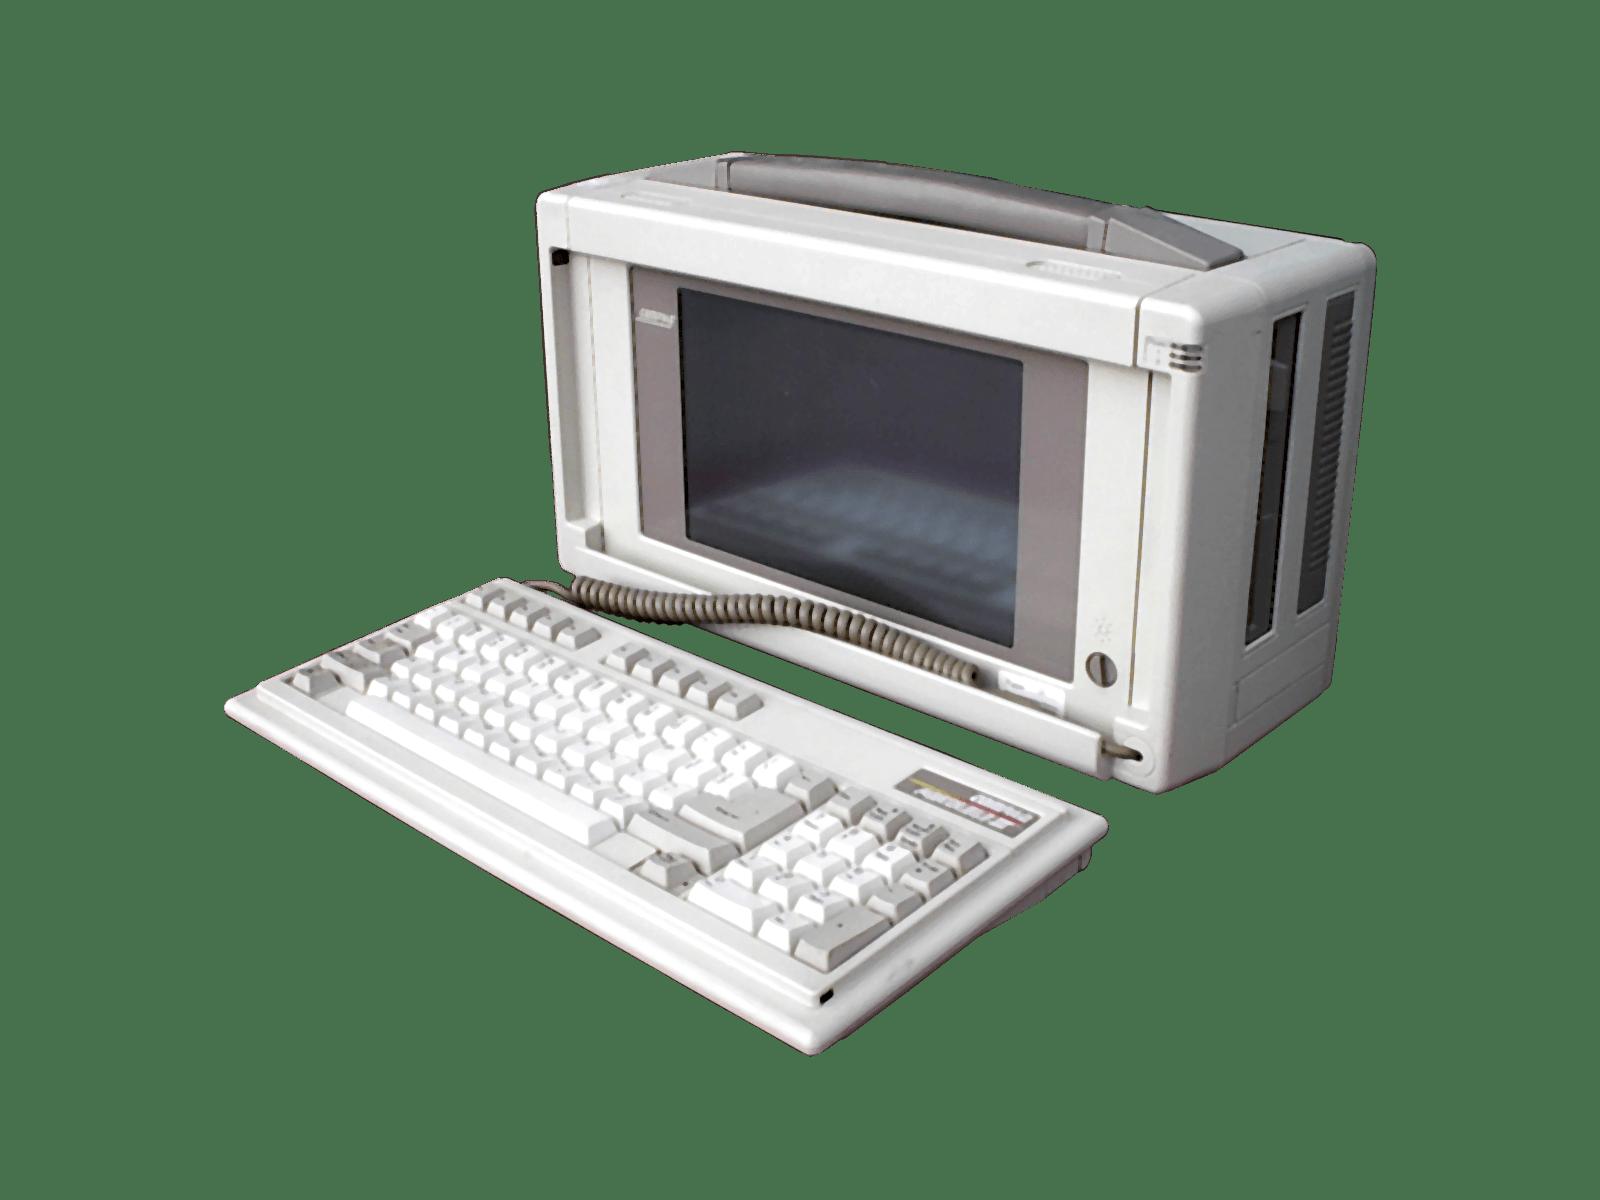 Compaq Vintage Computer transparent PNG.